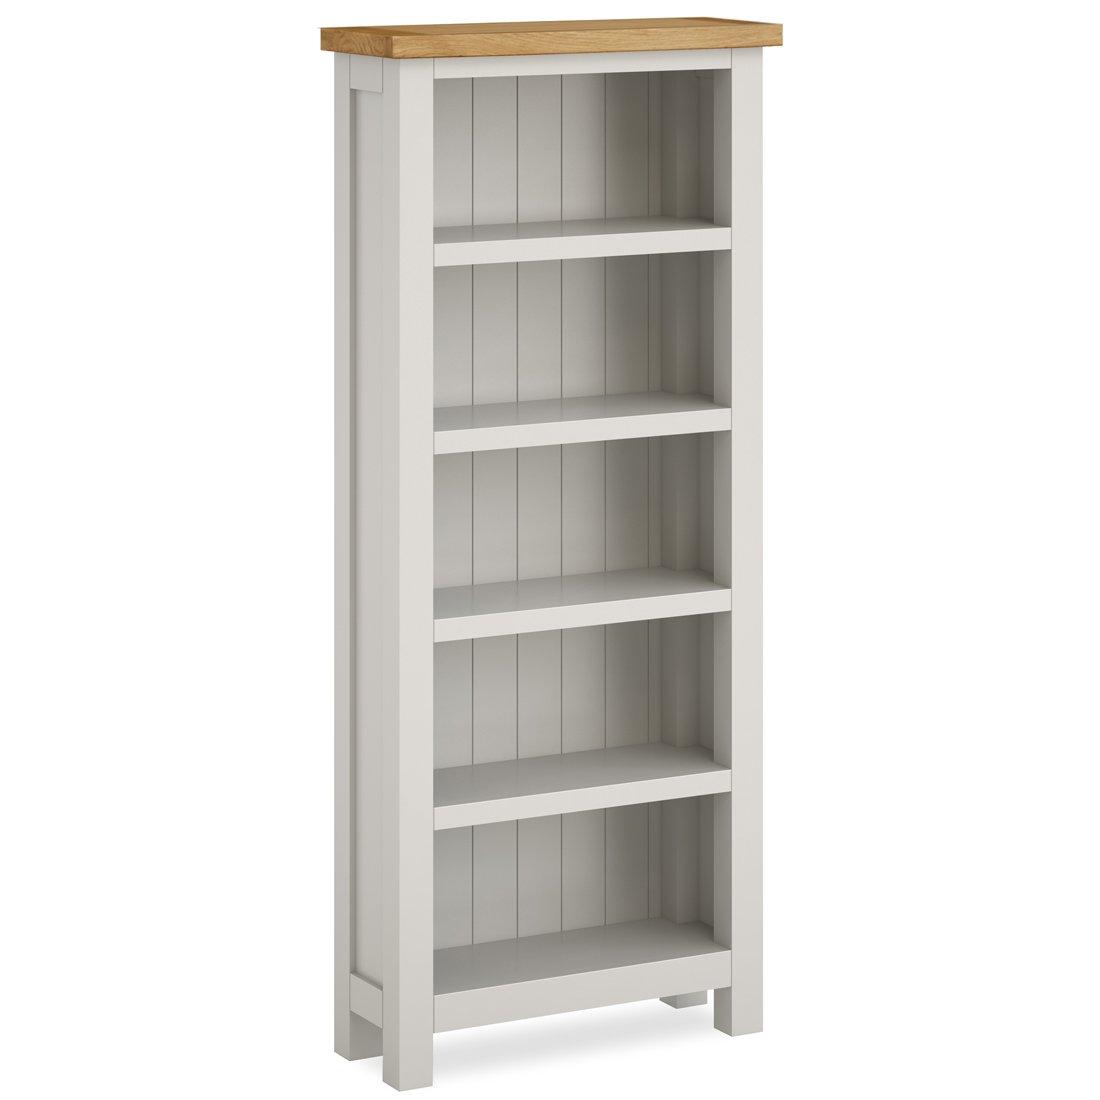 Farrow Painted Slim Bookcase / Stone Grey Bookcase / Oak Top / Assembled:  Amazon.co.uk: Kitchen & Home - Farrow Painted Slim Bookcase / Stone Grey Bookcase / Oak Top